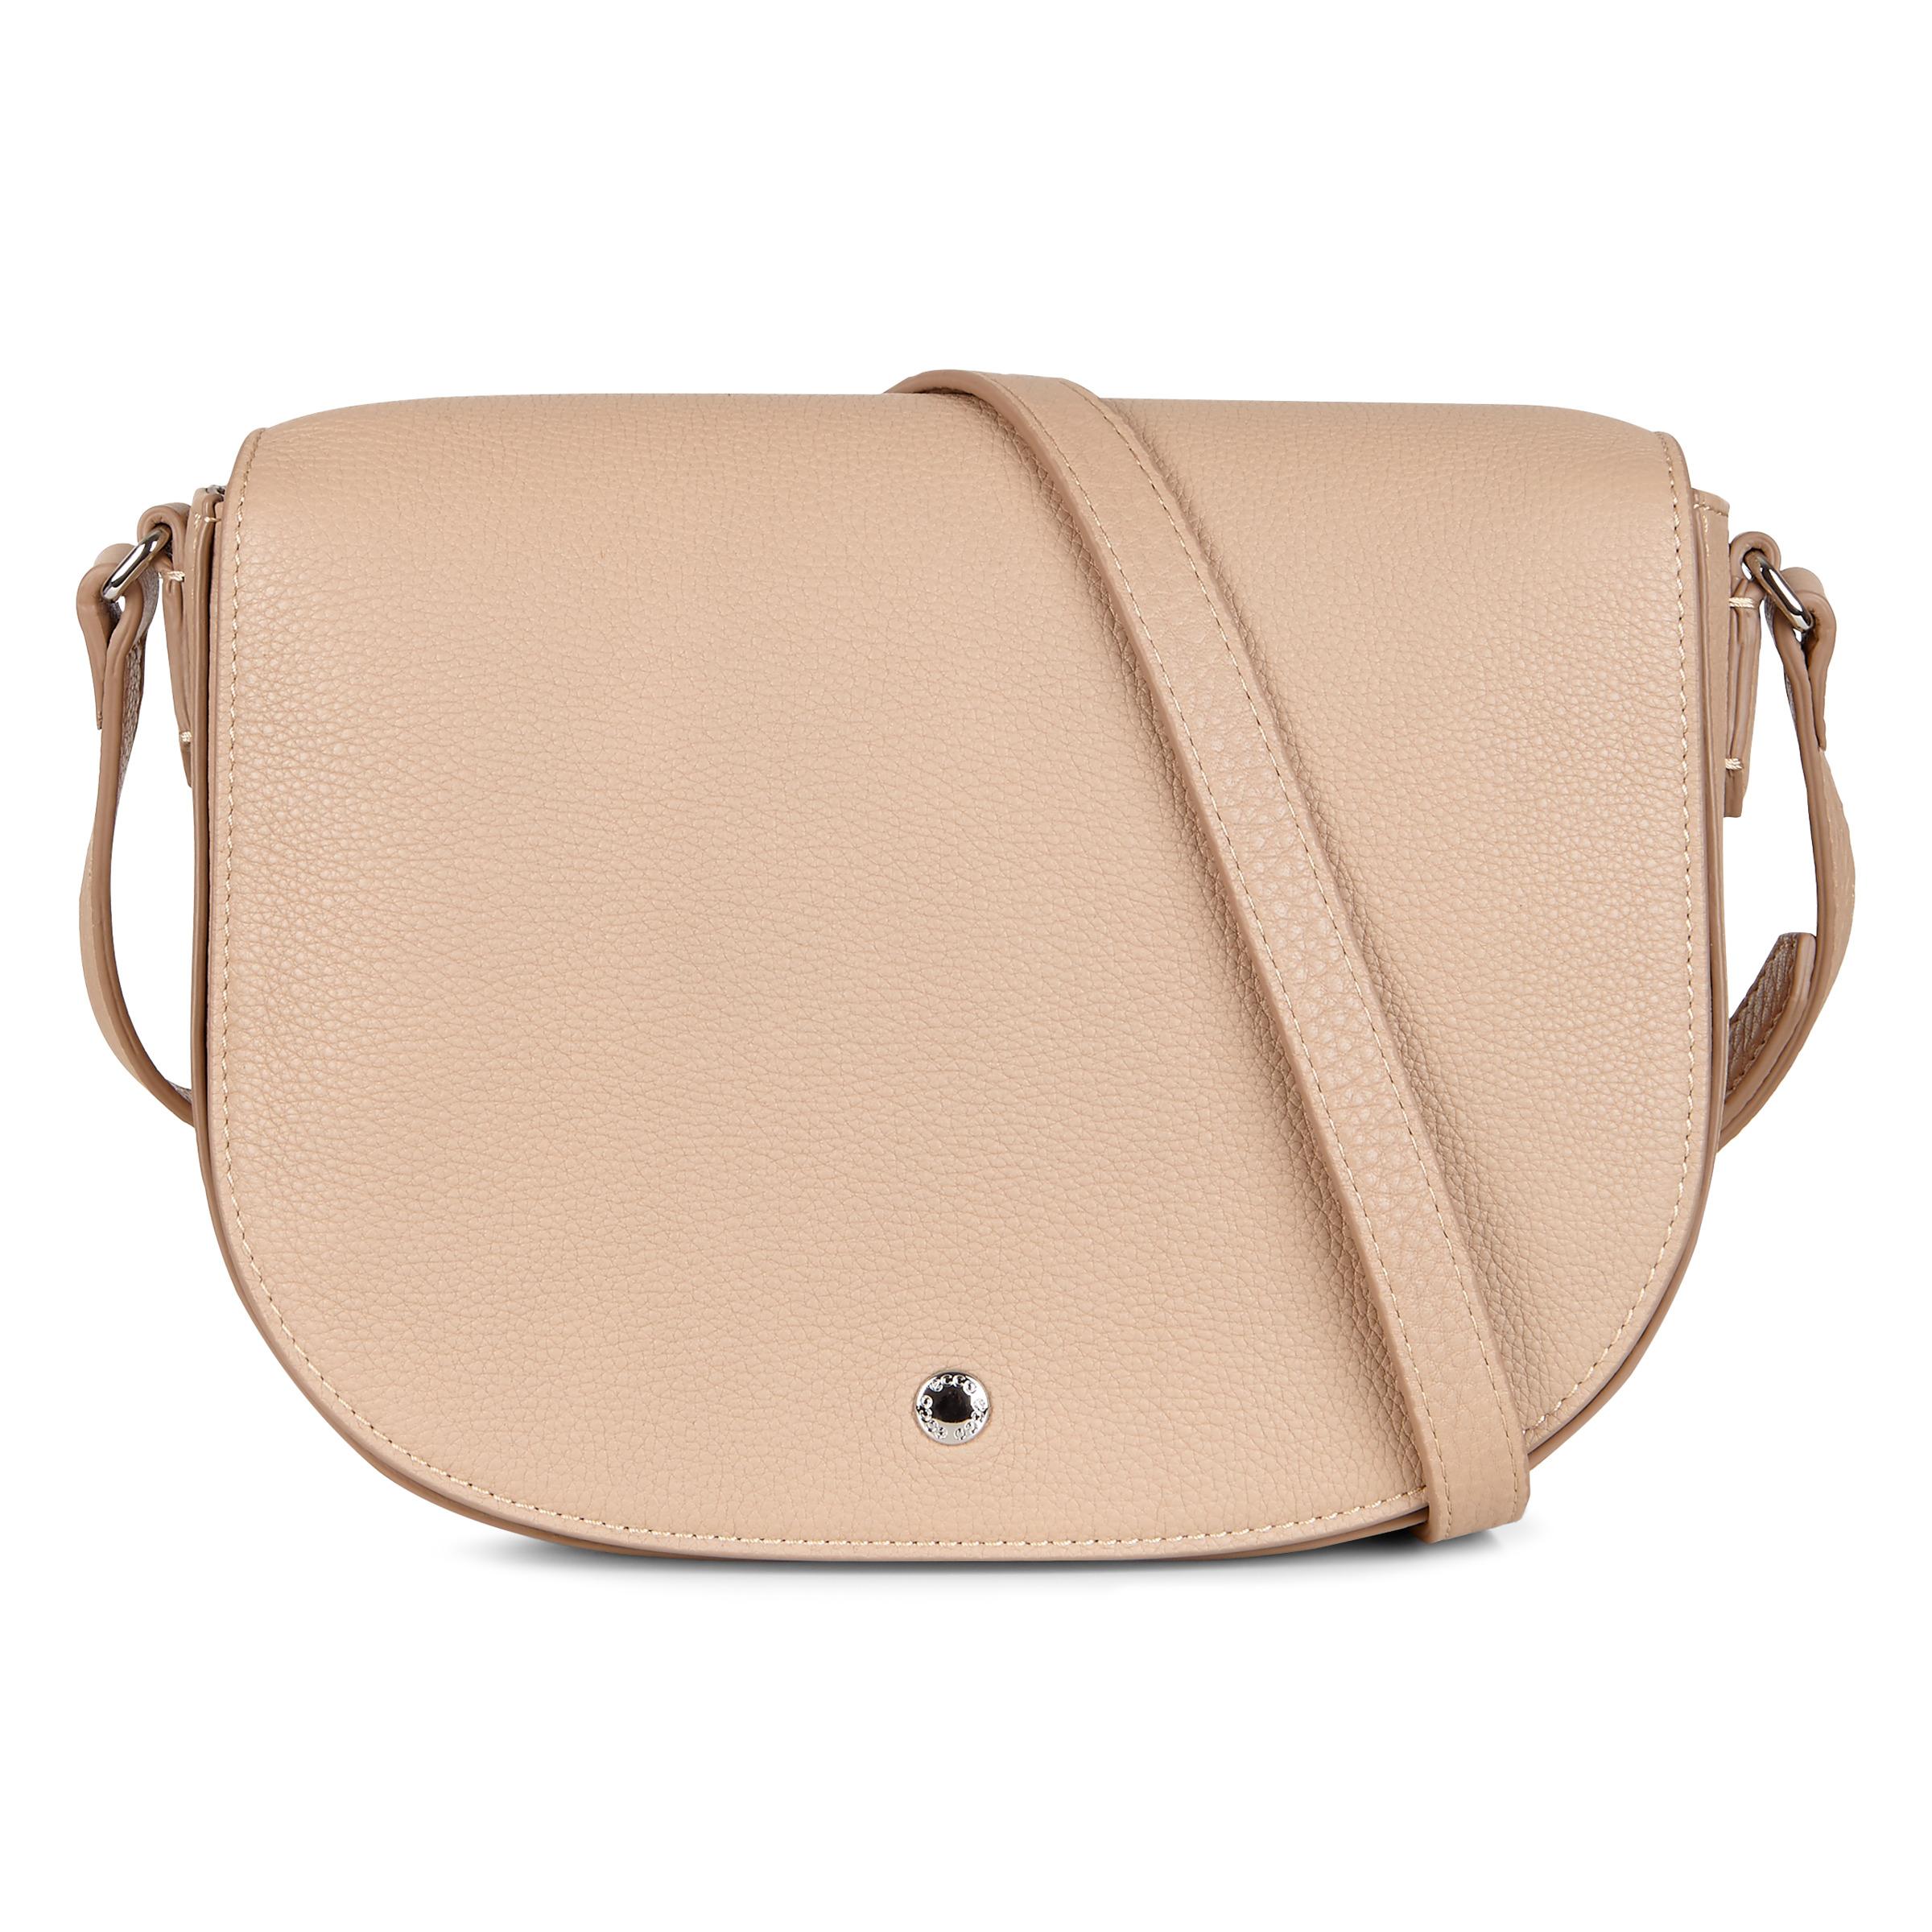 Image of ECCO Kauai Medium Saddle Bag